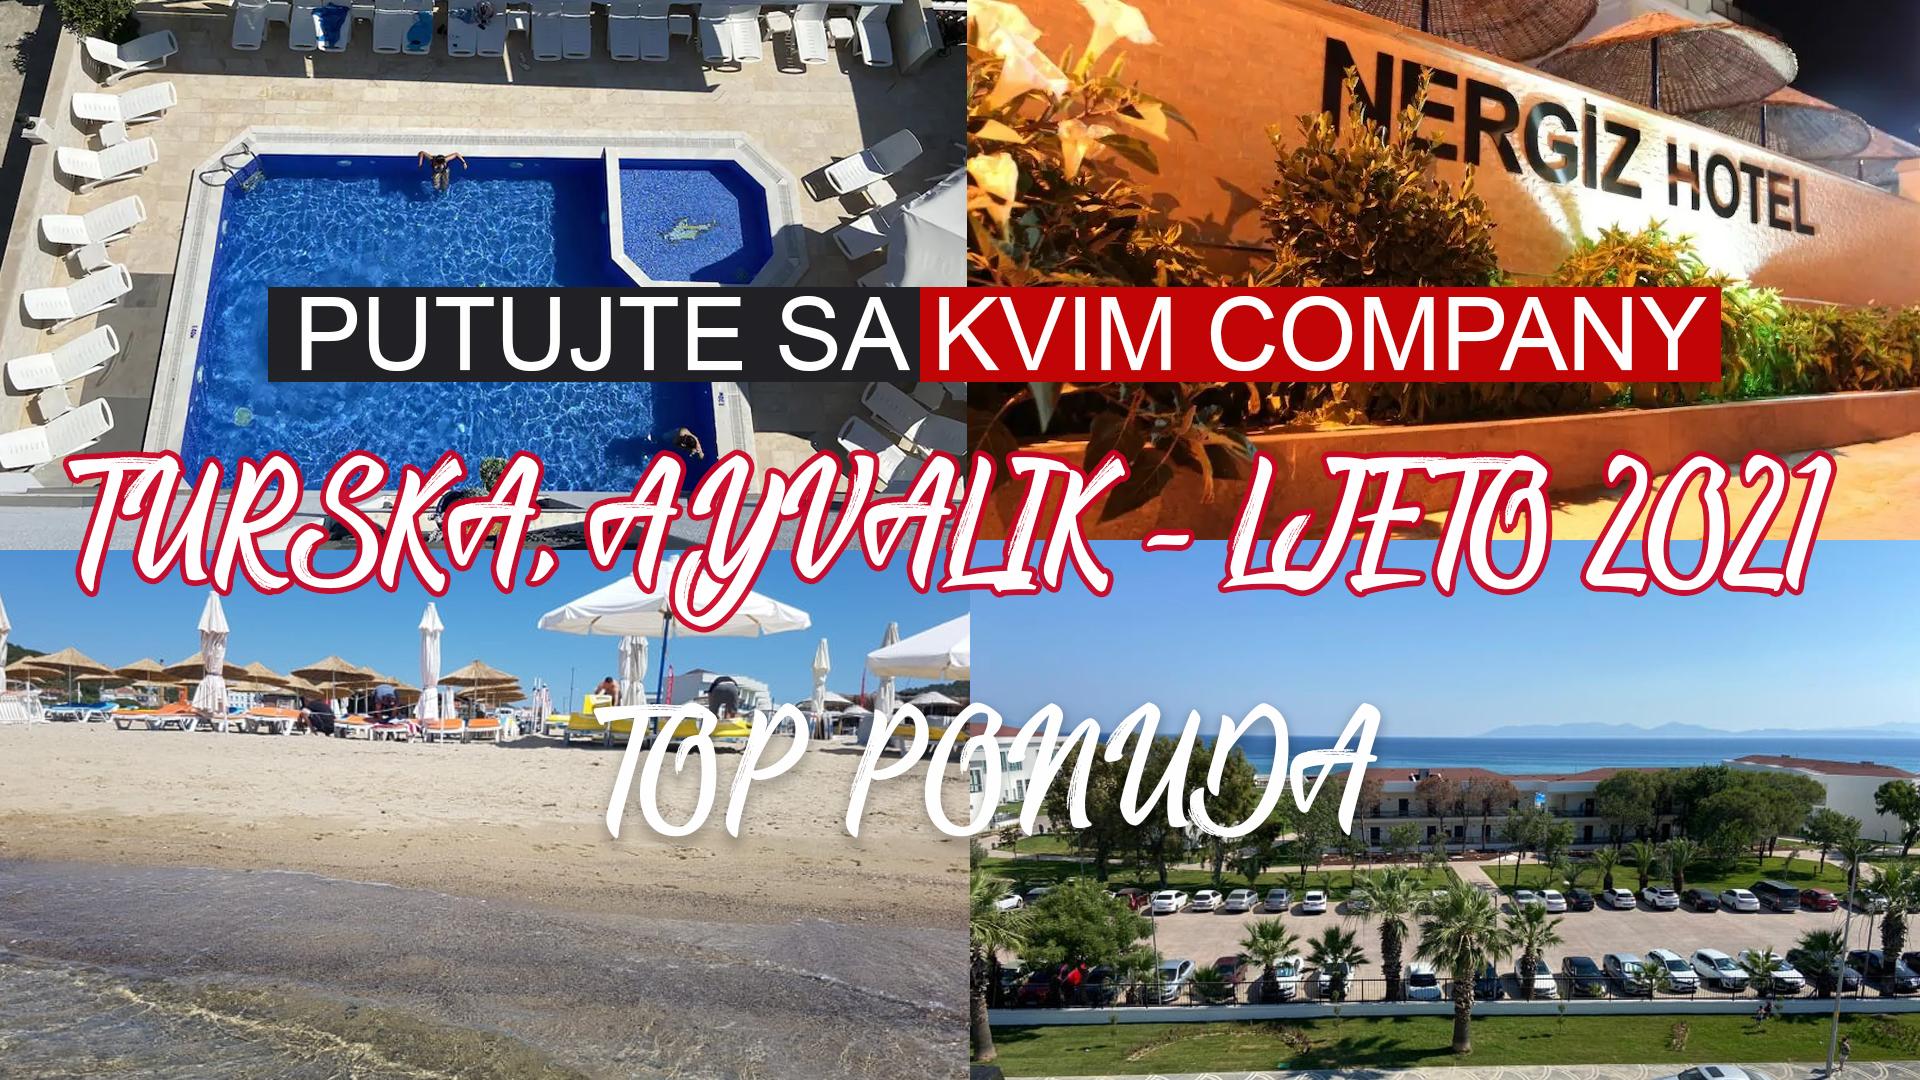 Turska, Ayvalik- Ljeto 2021 – Kvim Company